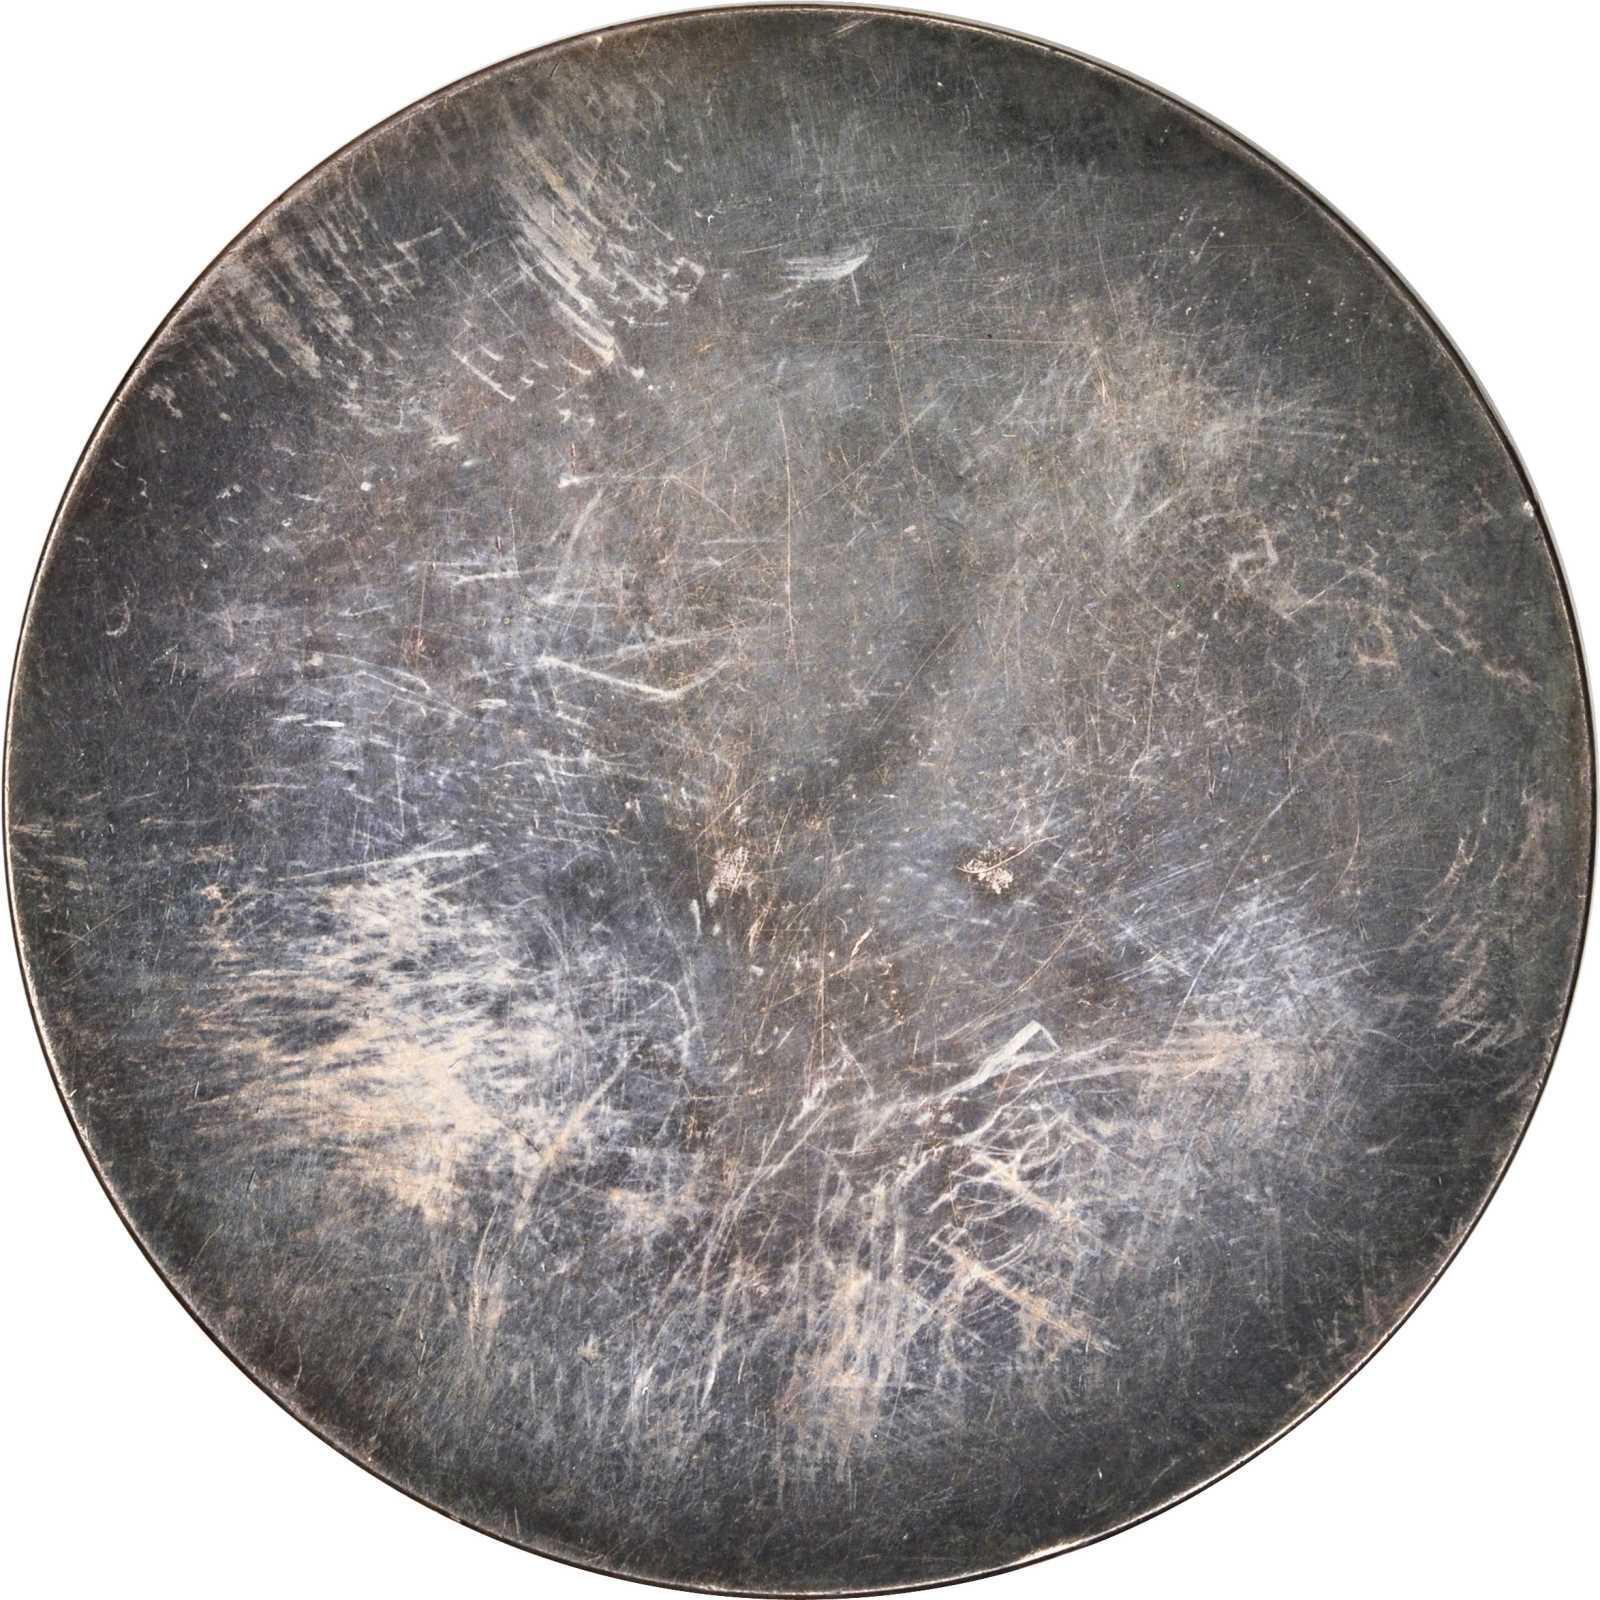 Bryan 1896 Silver Dollar Roximate Cur Value 100